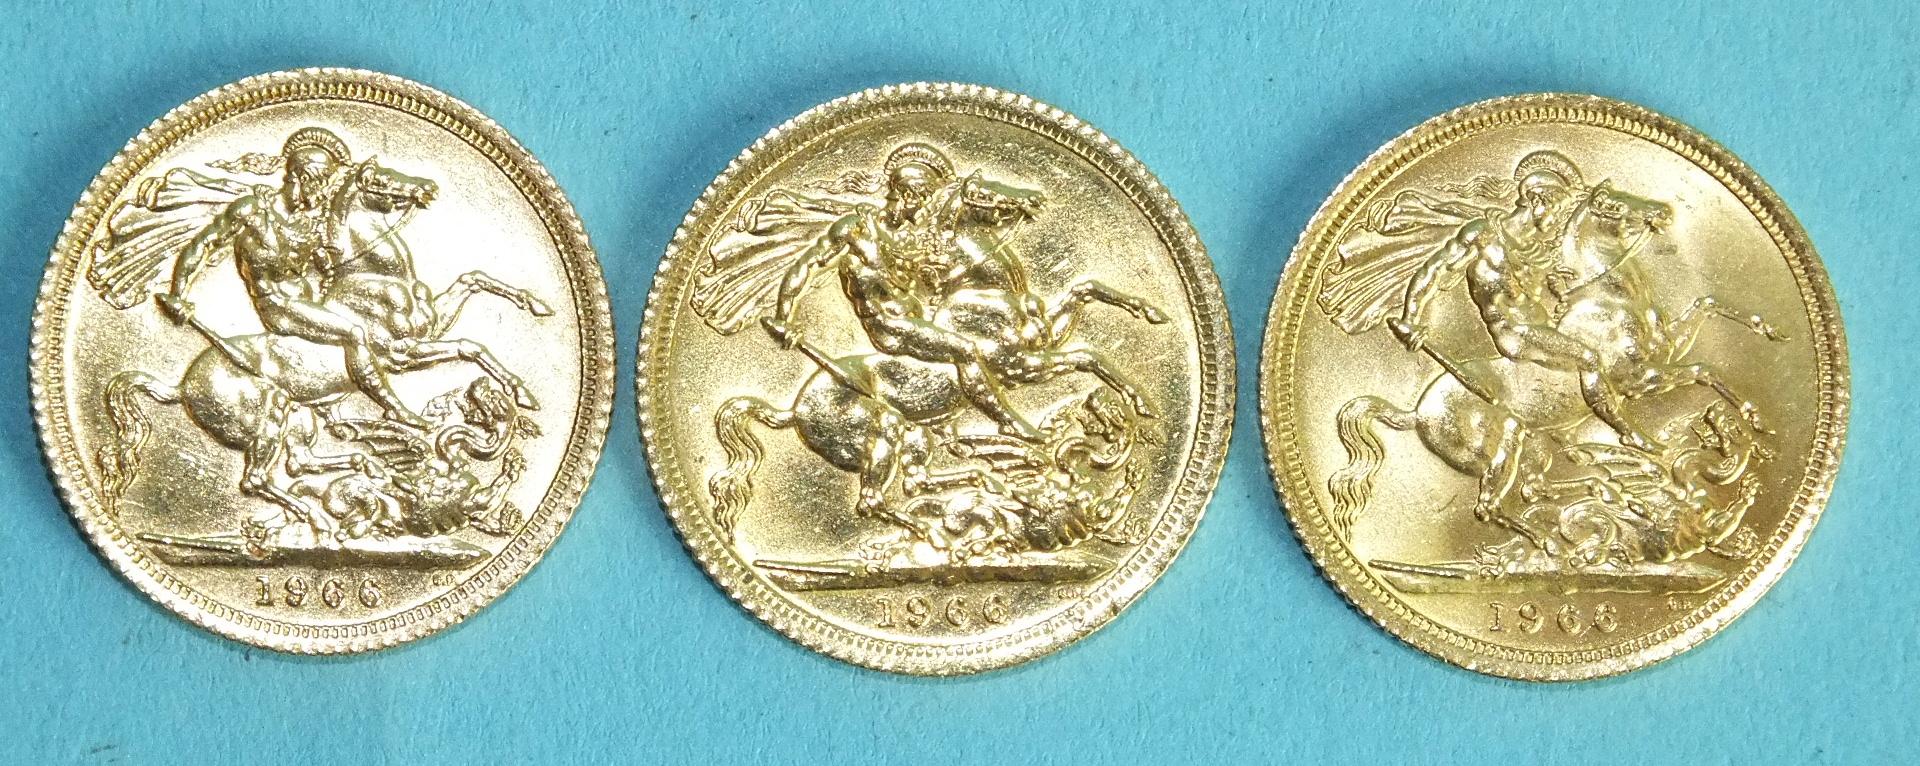 Lot 379 - Three Elizabeth II 1966 sovereigns, (3).